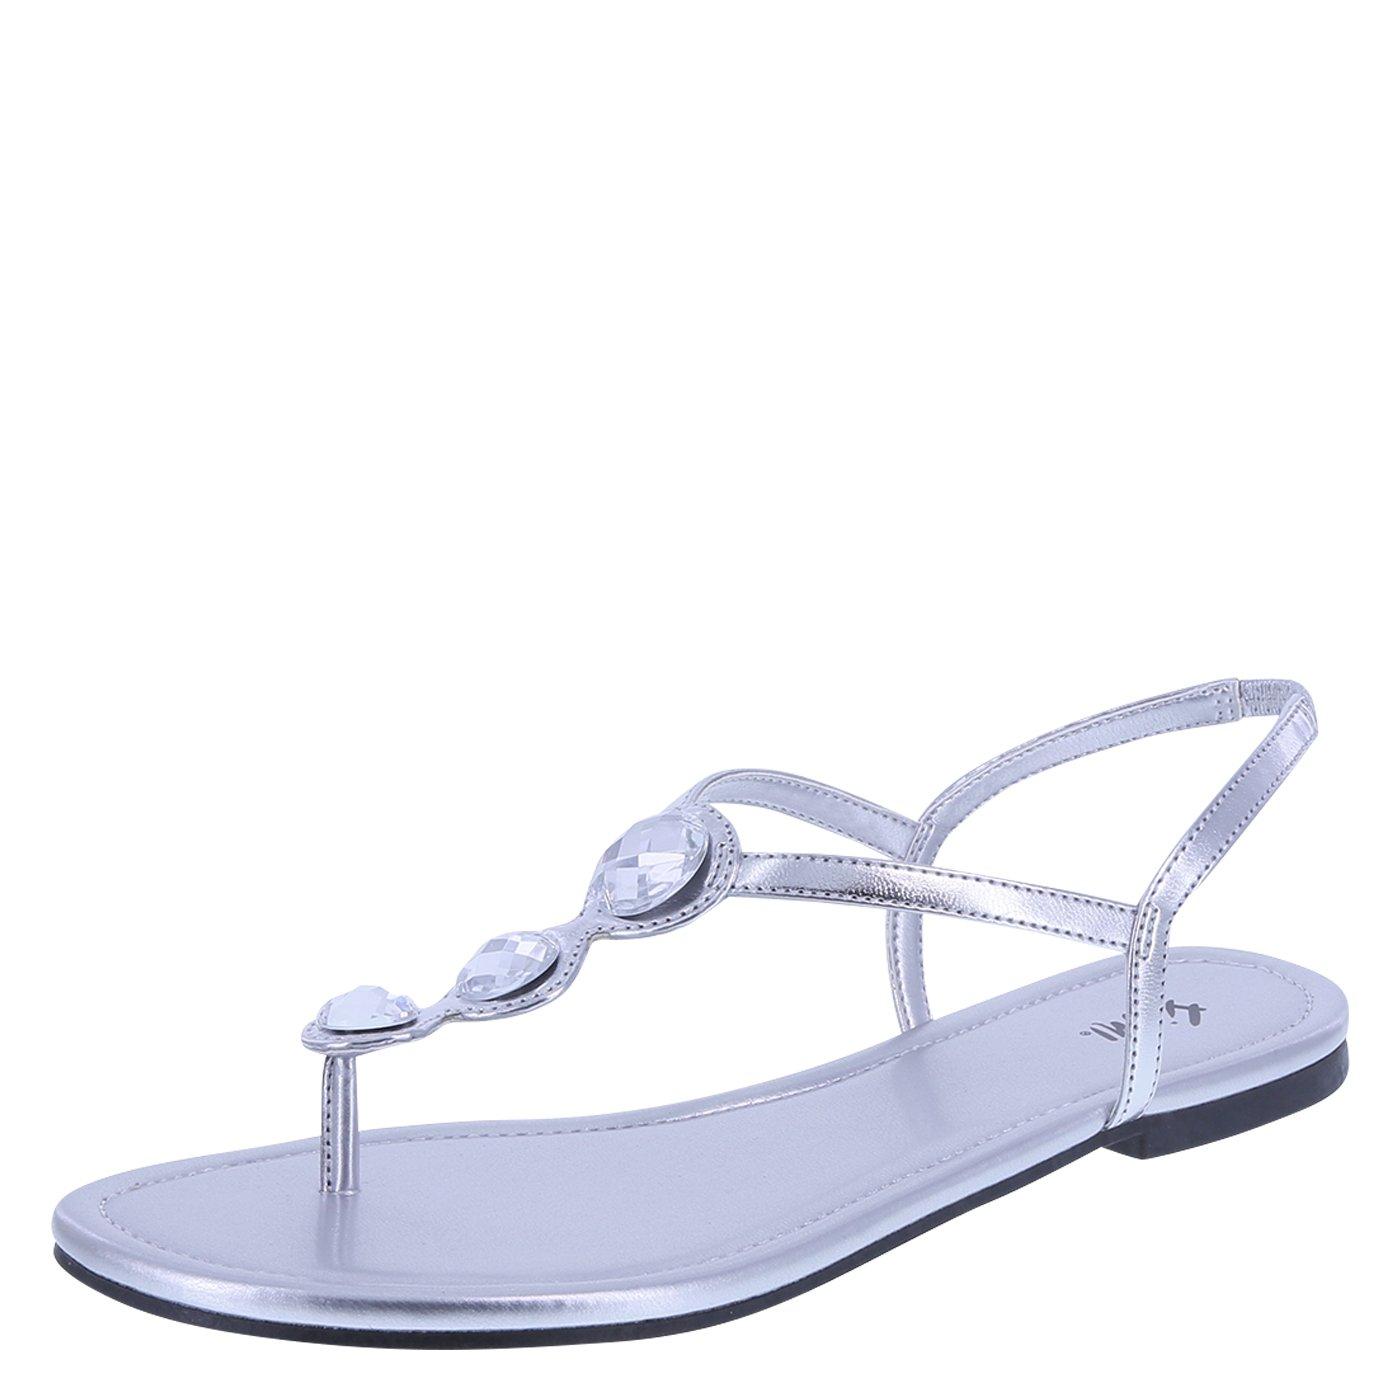 Fioni Women's Silver Women's Present Flat Sling 9.5 Regular